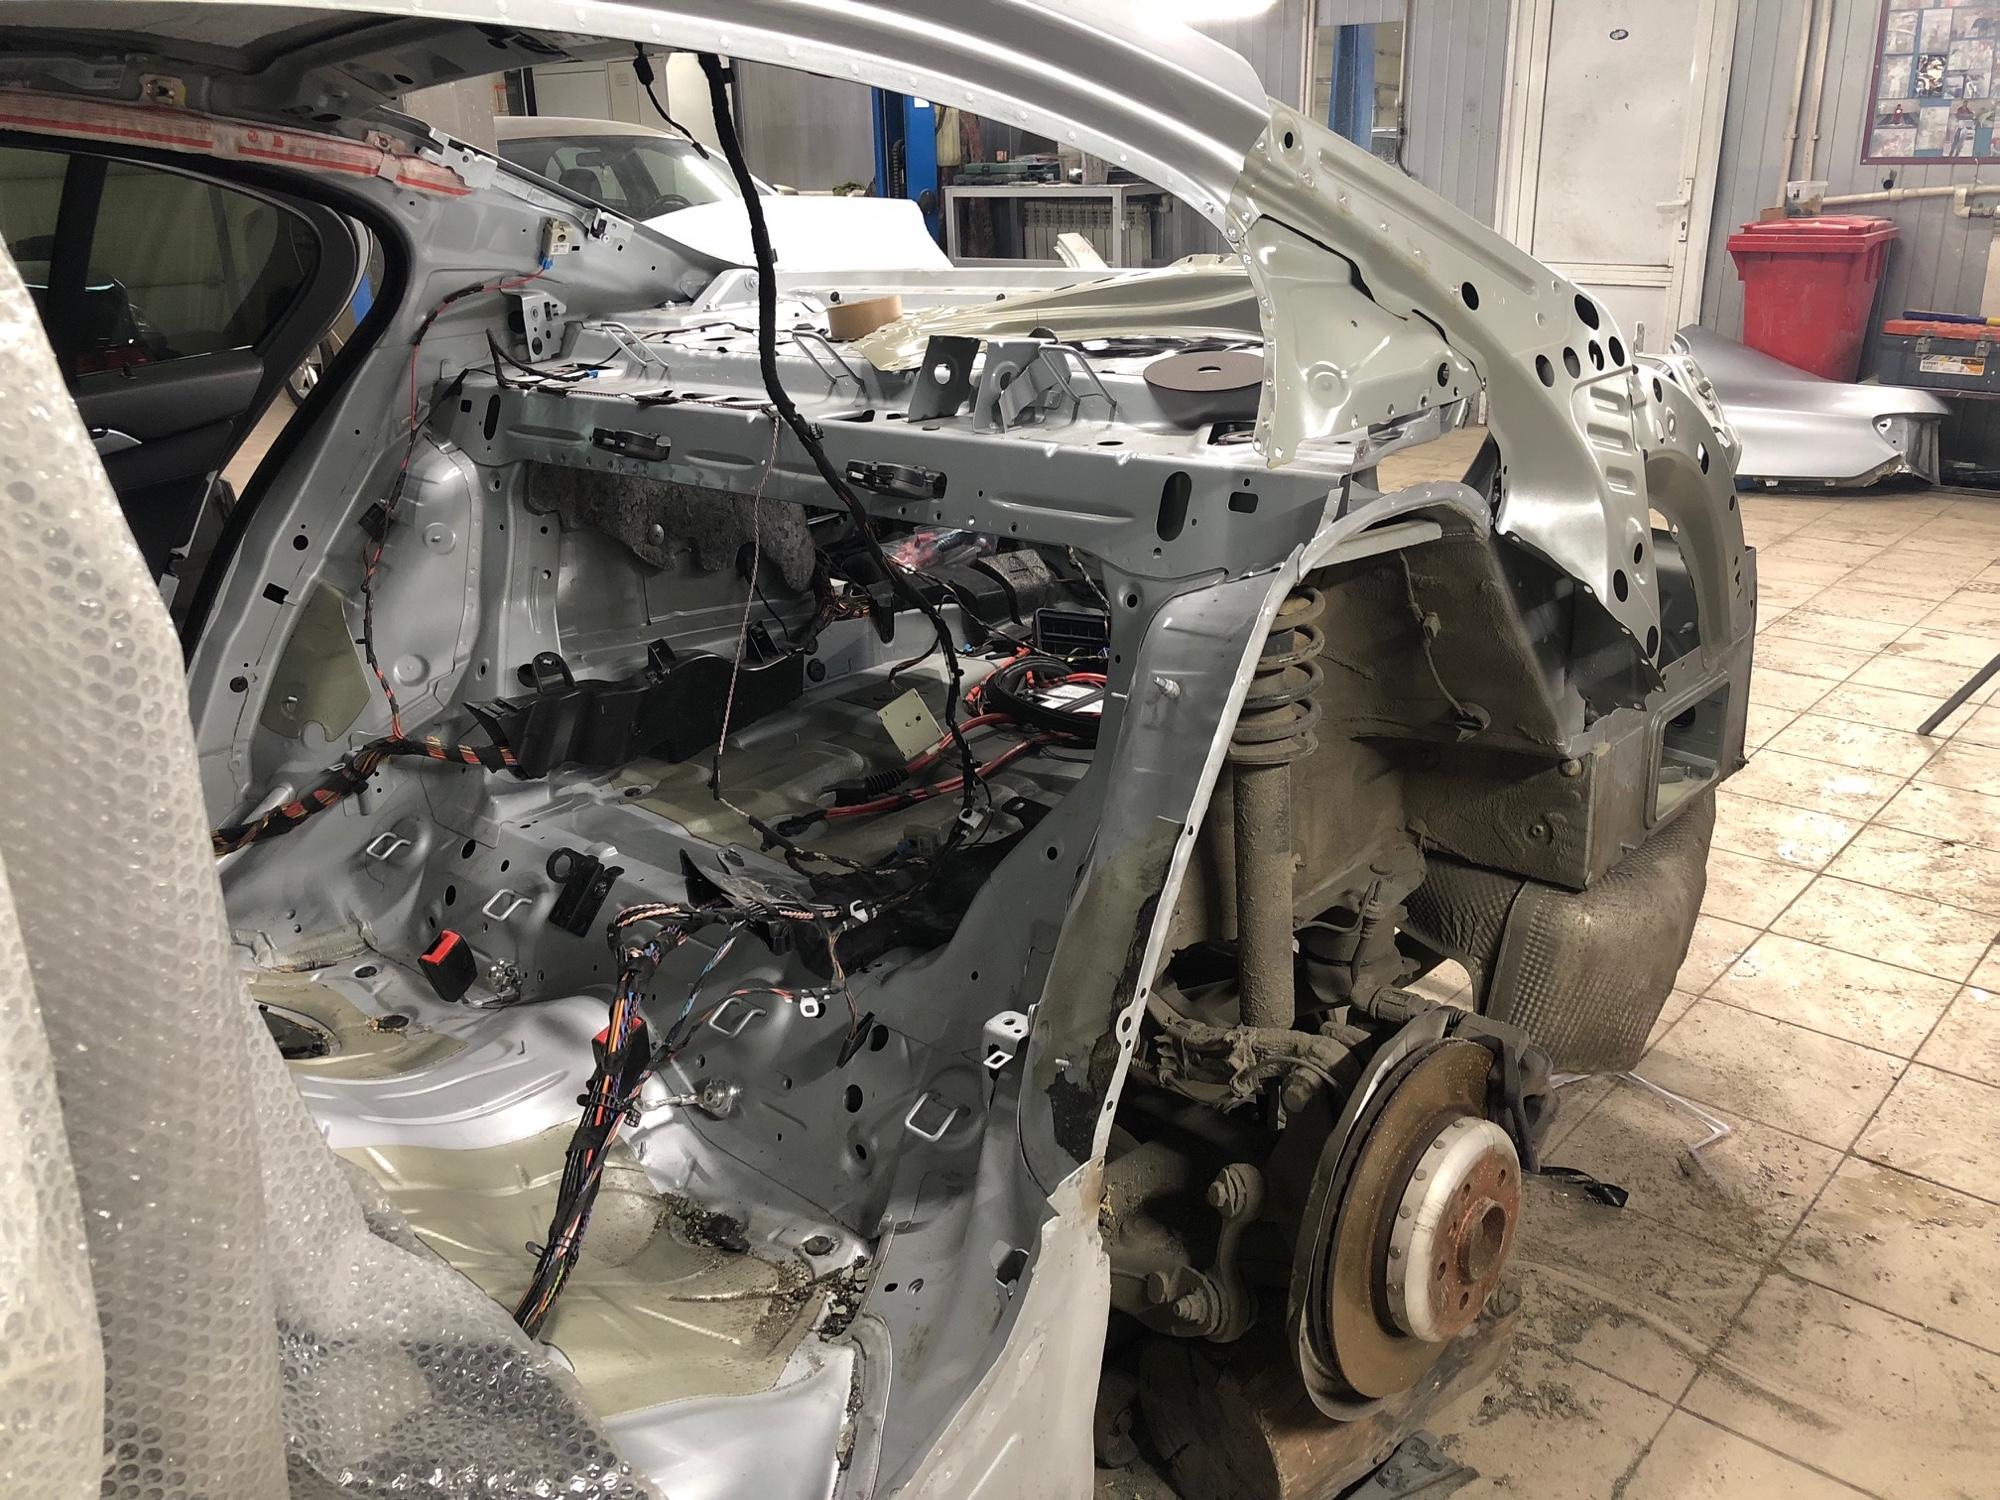 Ремонт задней части BMW 5 Series на стапеле